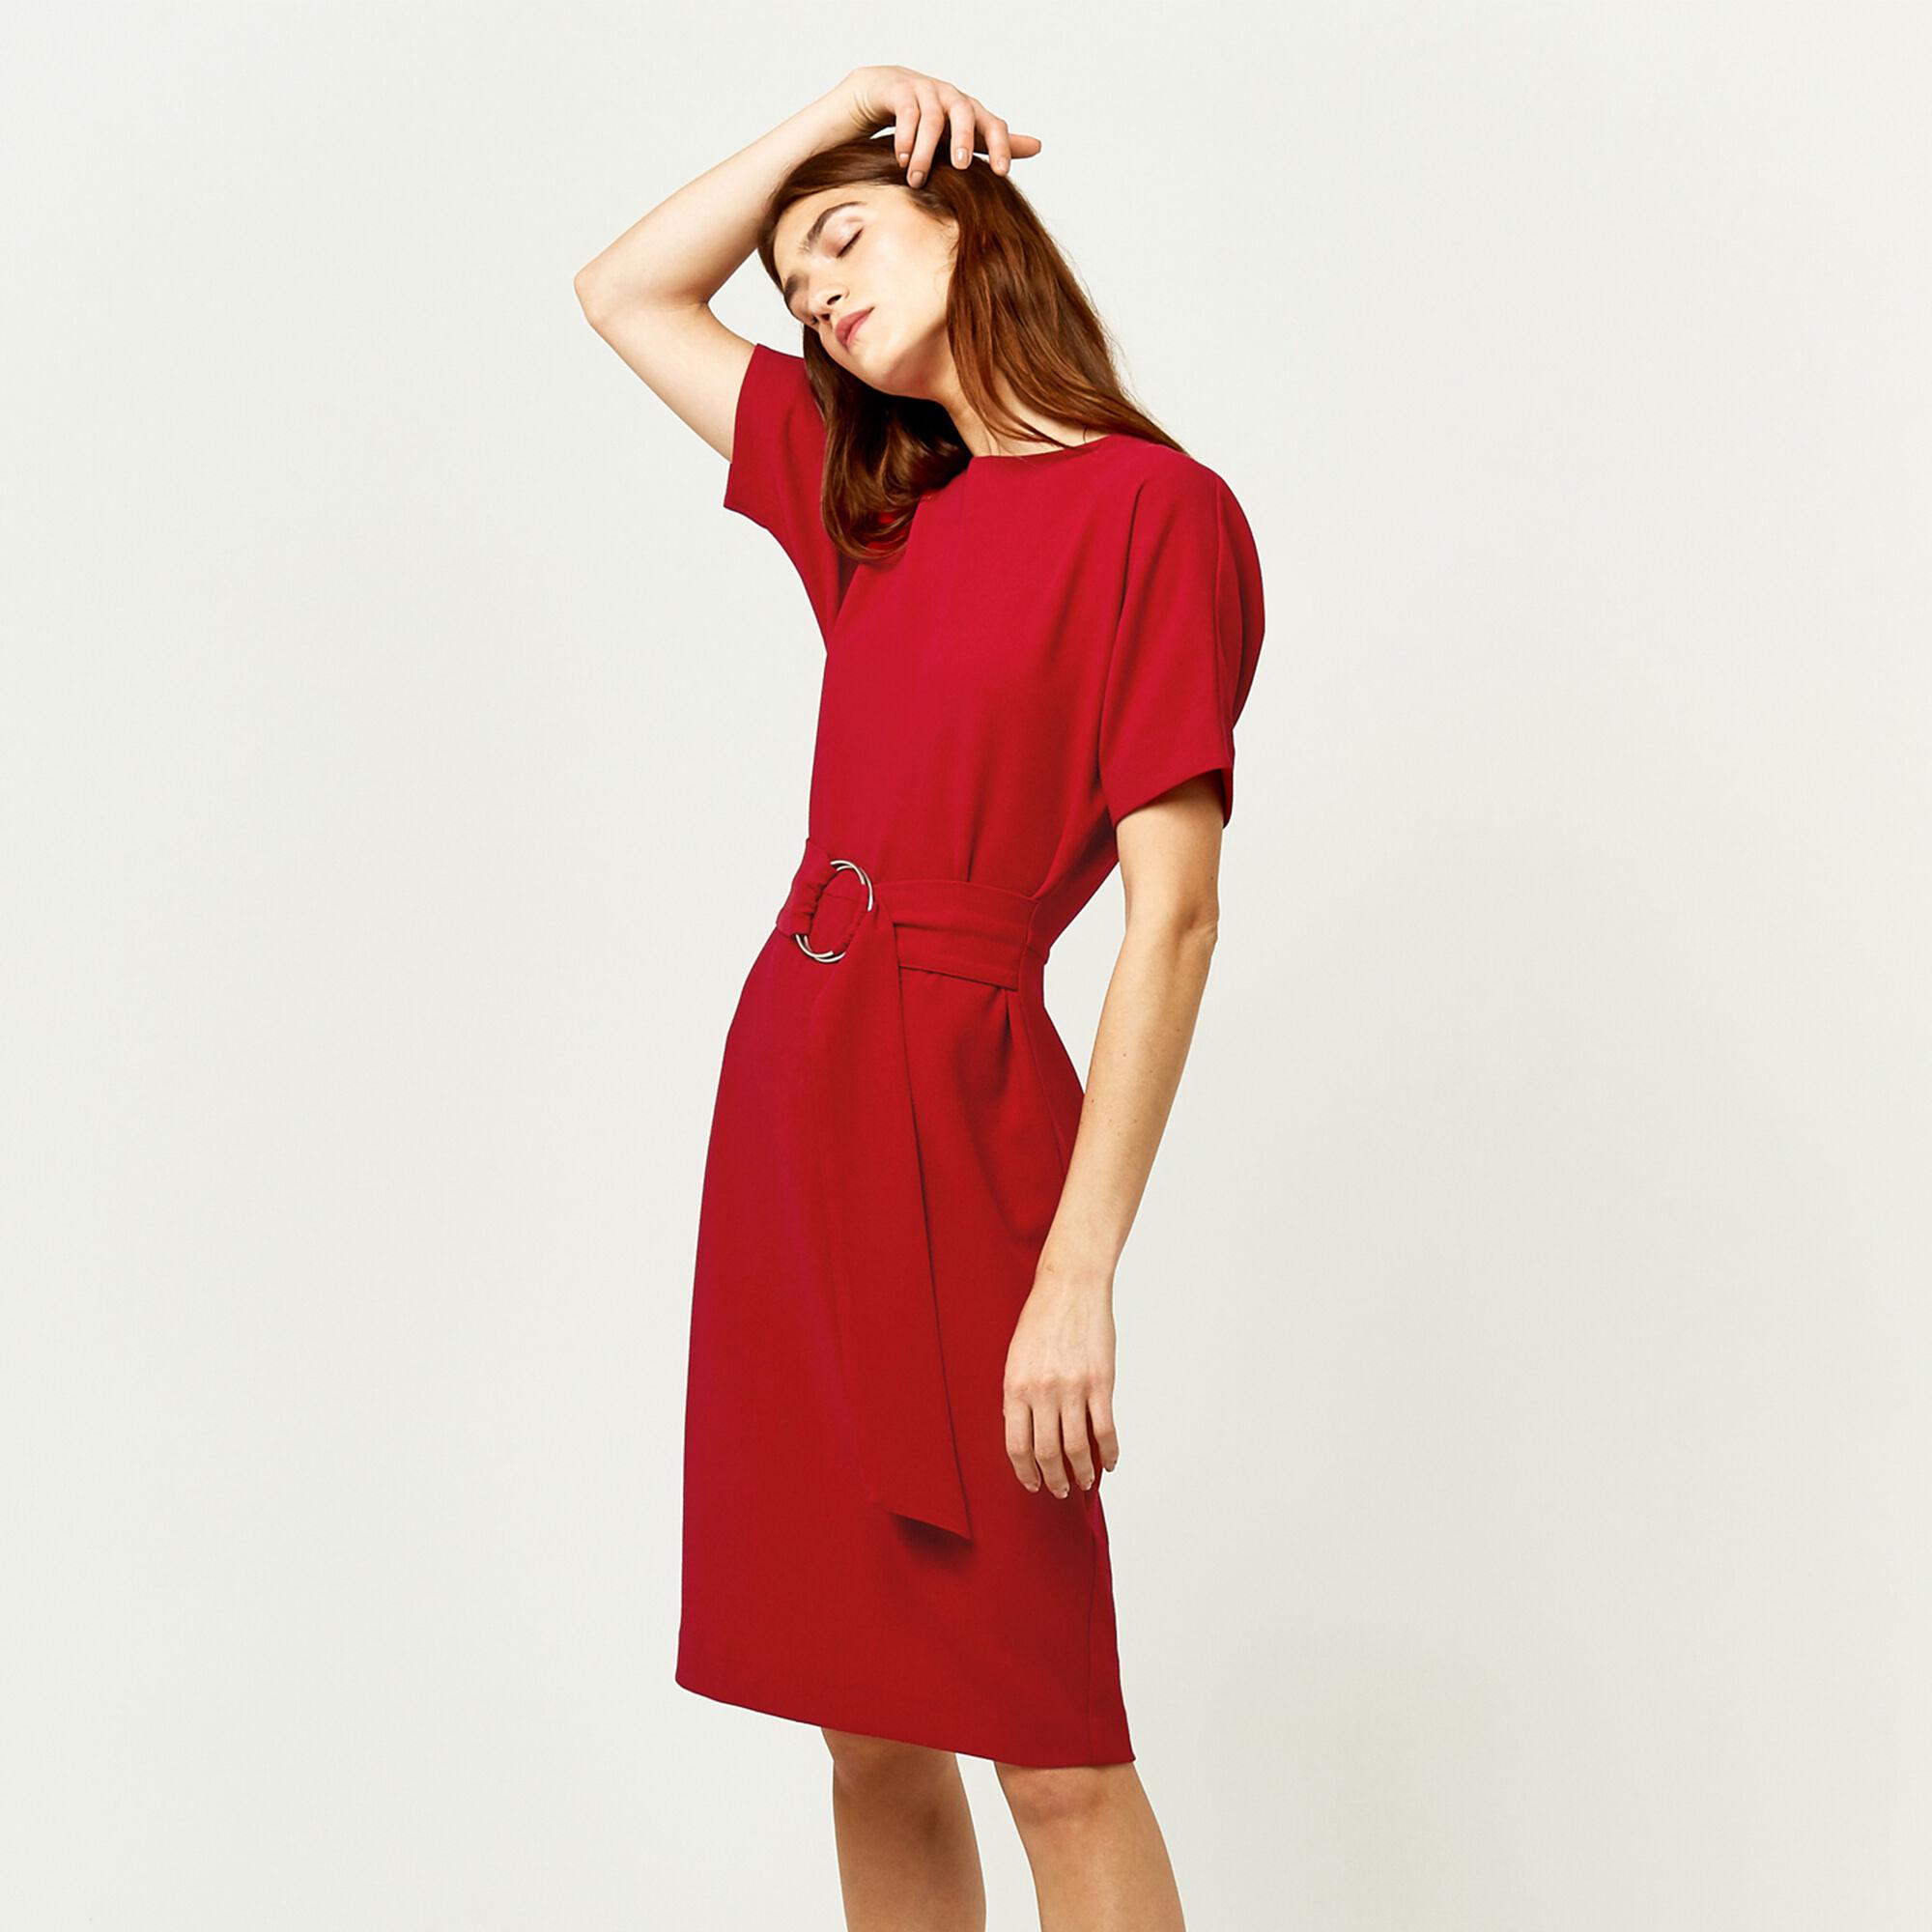 Warehouse, O RING DRESS Dark Red 1